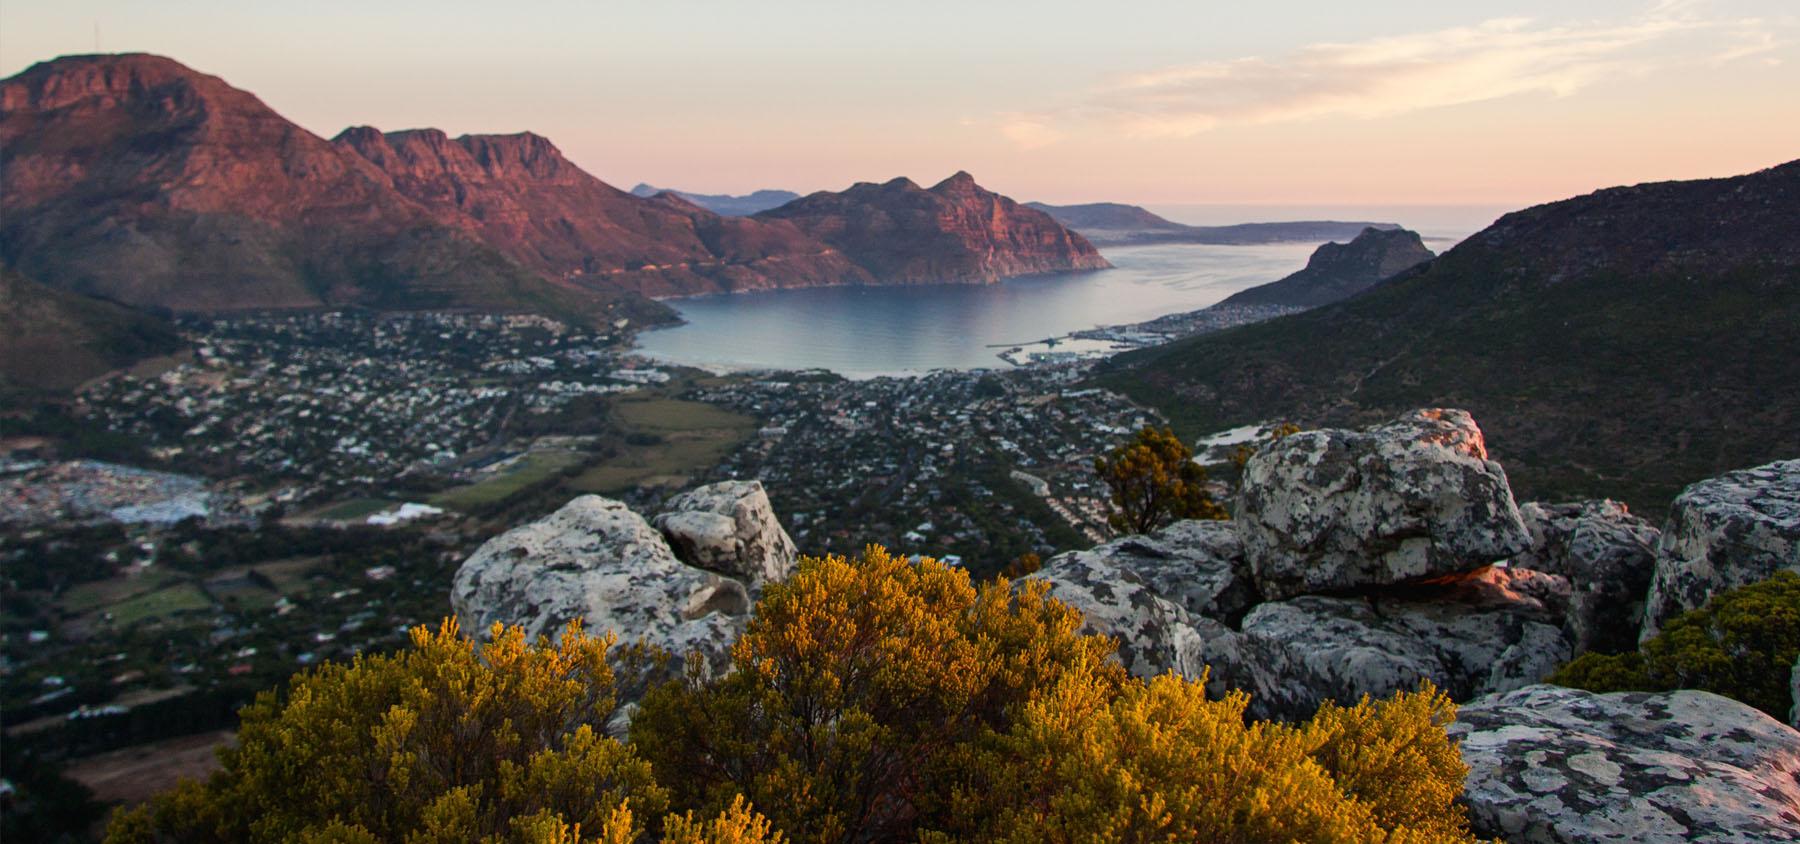 Luxury Cape Town Tour